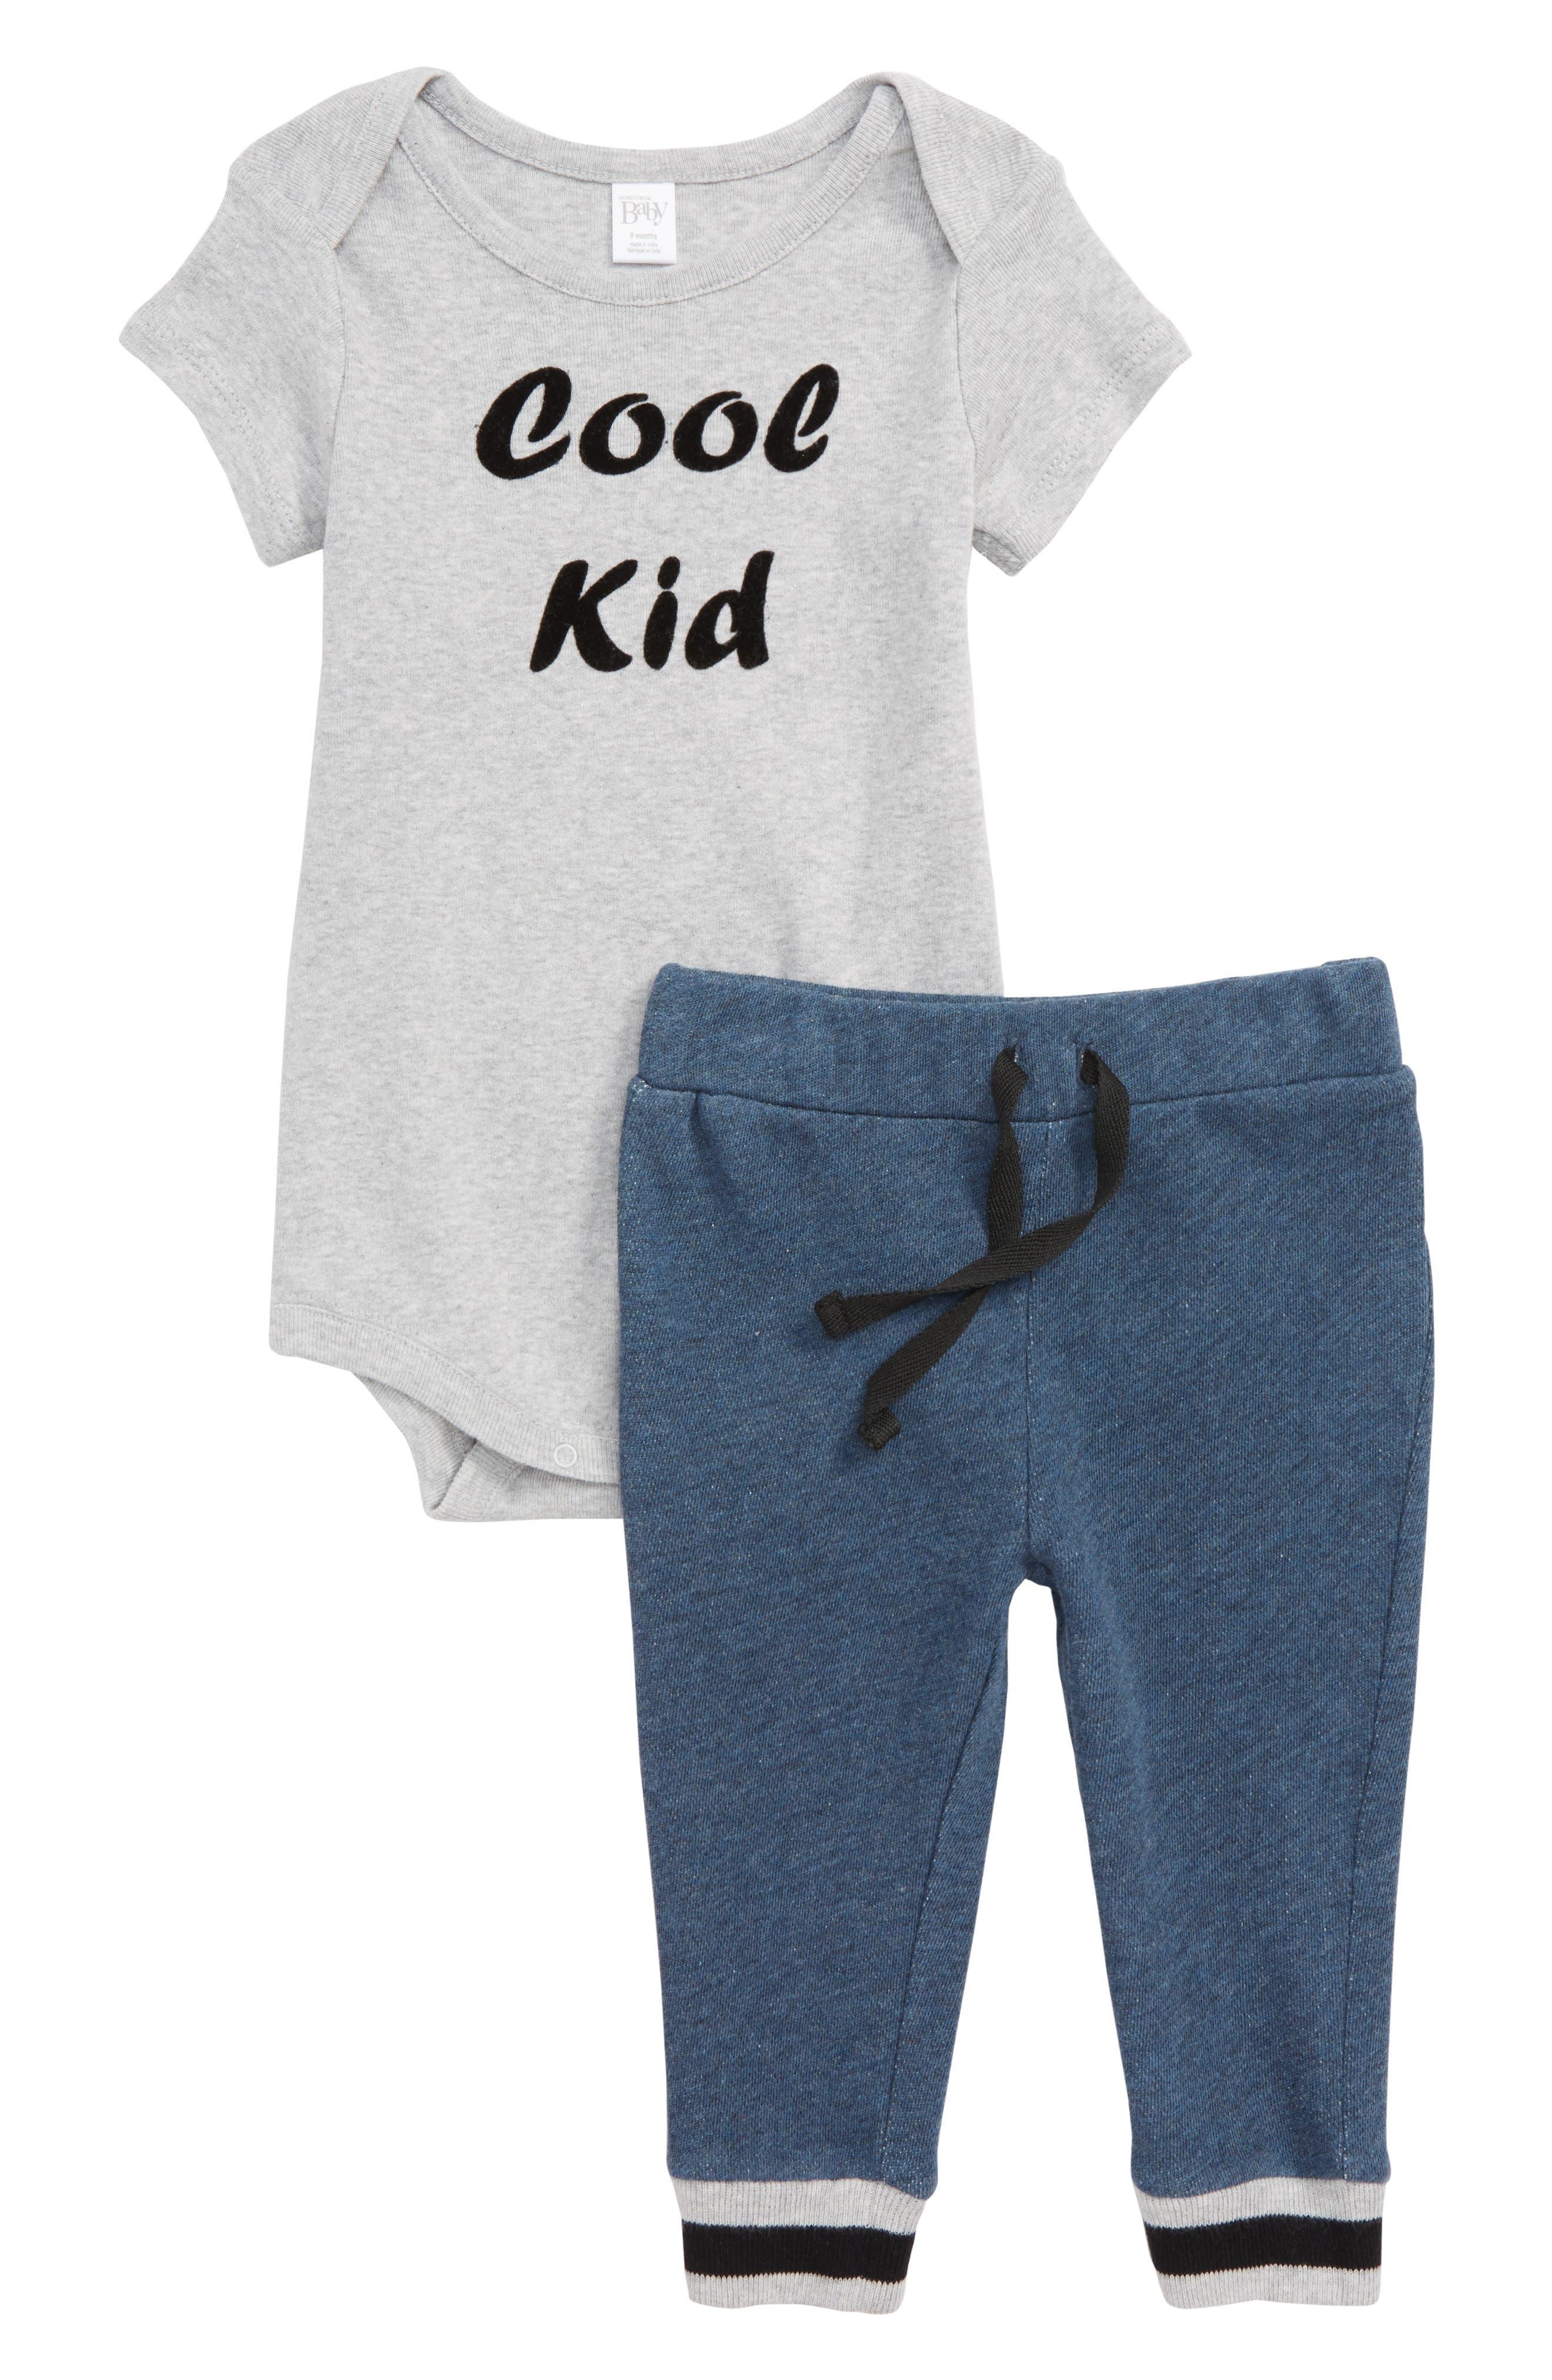 Cool Kid Bodysuit & Sweatpants Set,                         Main,                         color, GREY ASH HEATHER COOL KID